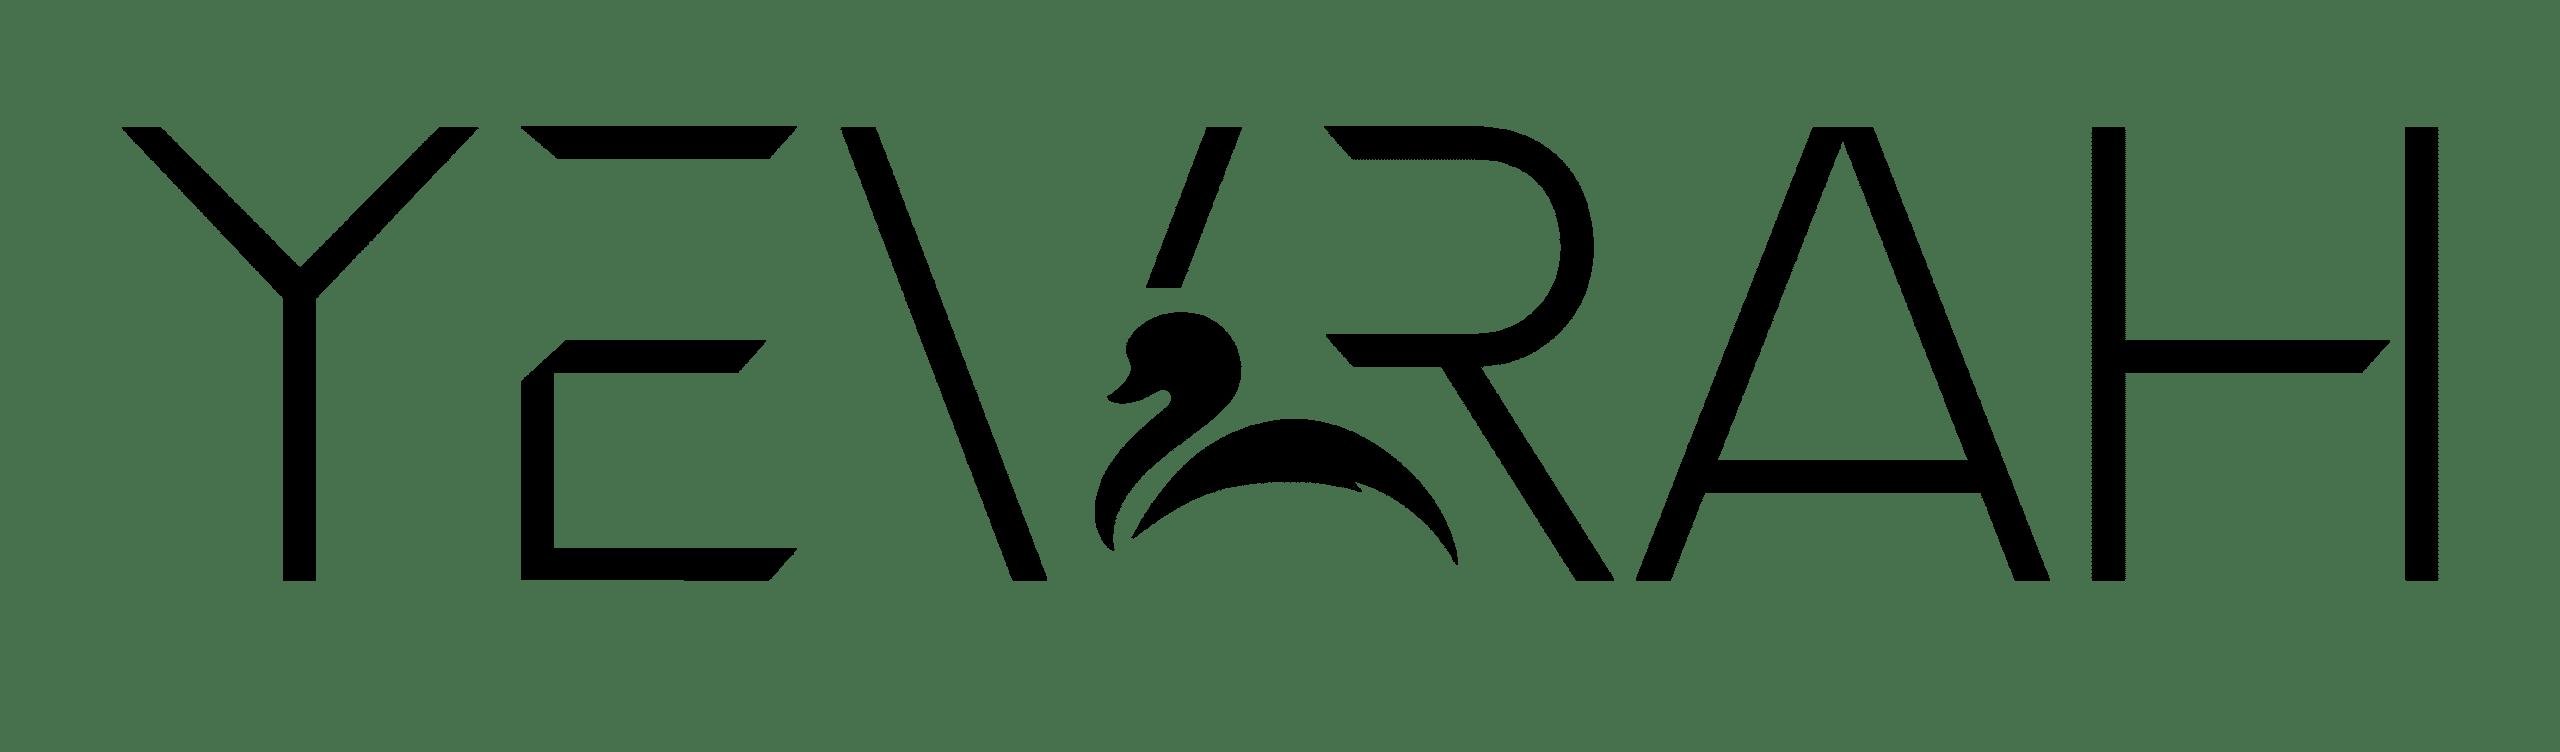 Yevrah-logo